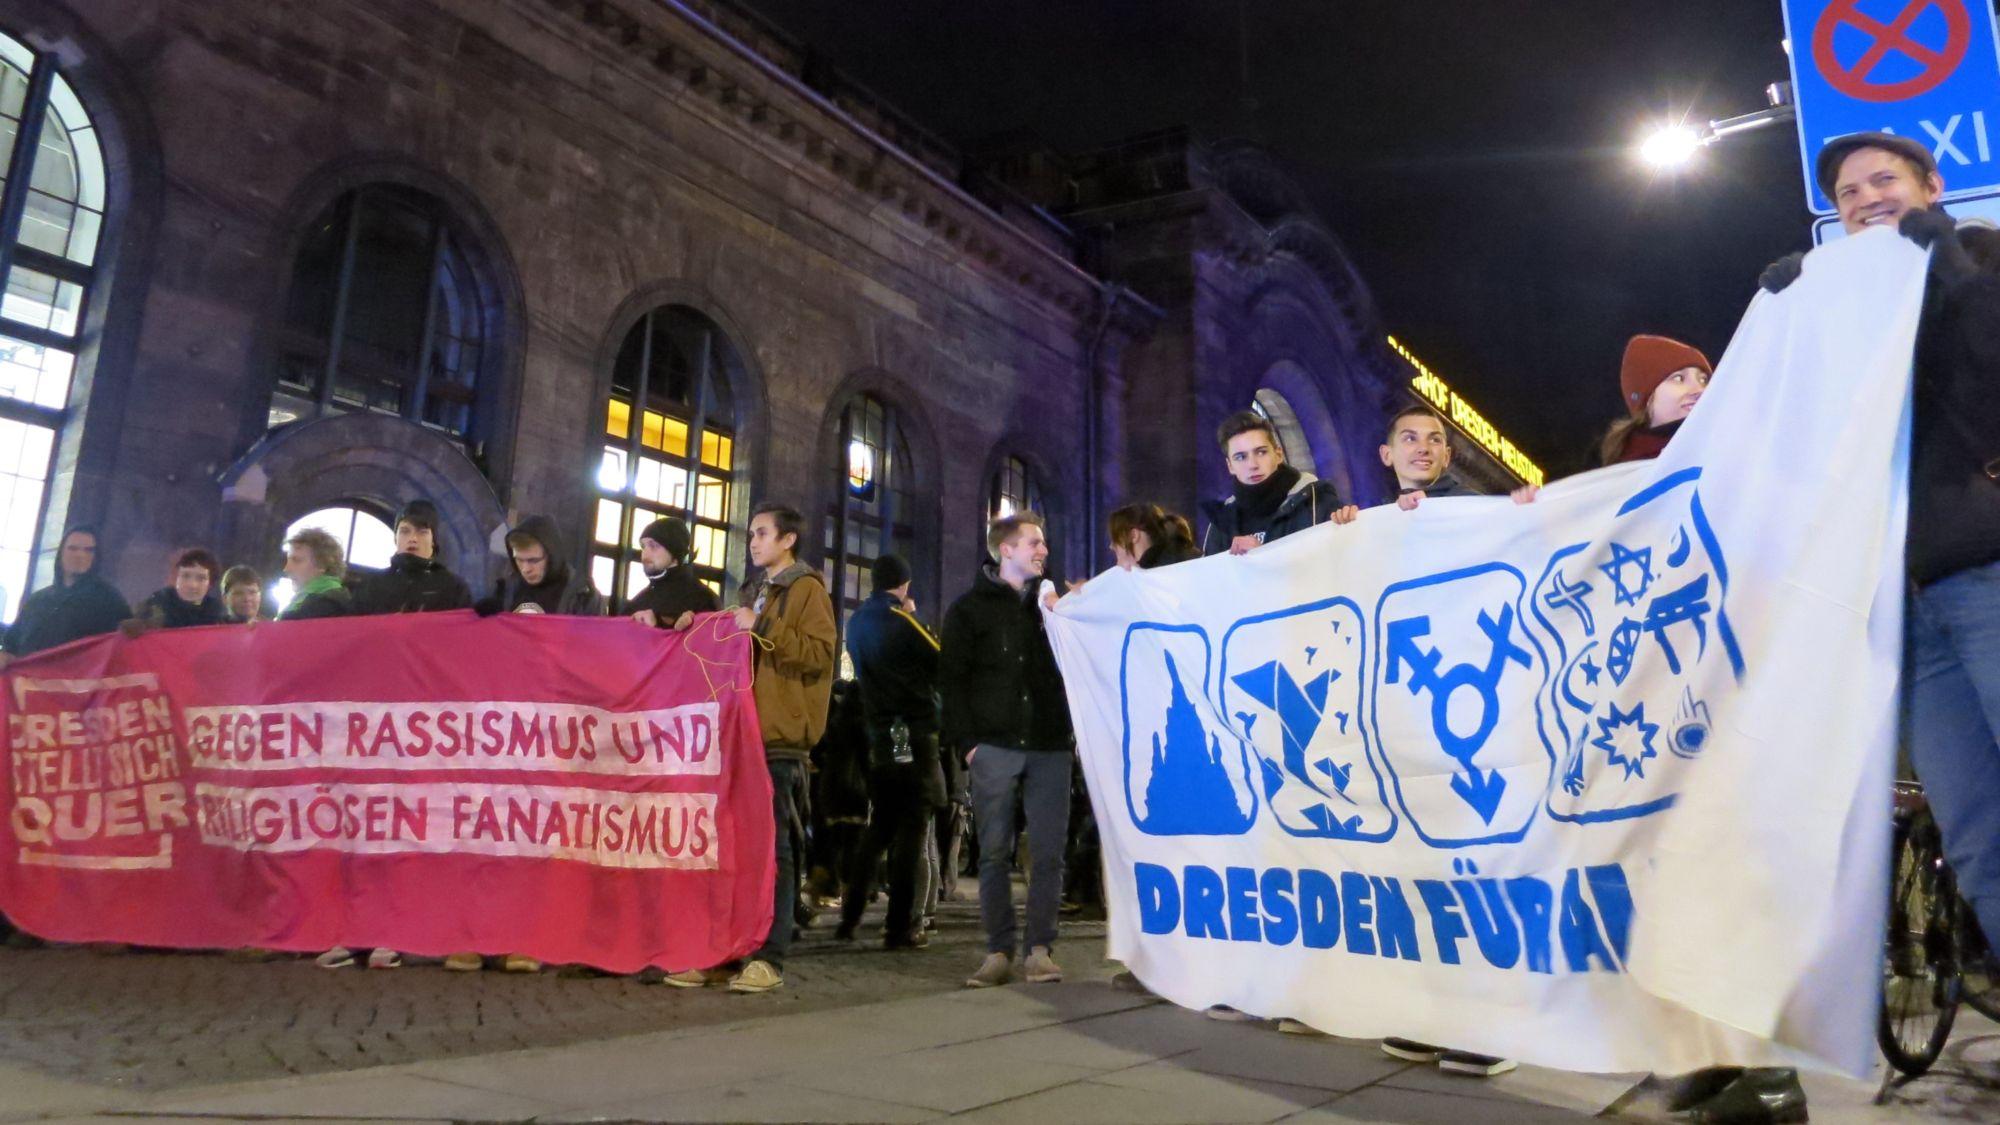 NoPegida-Demo am 15. Dezember